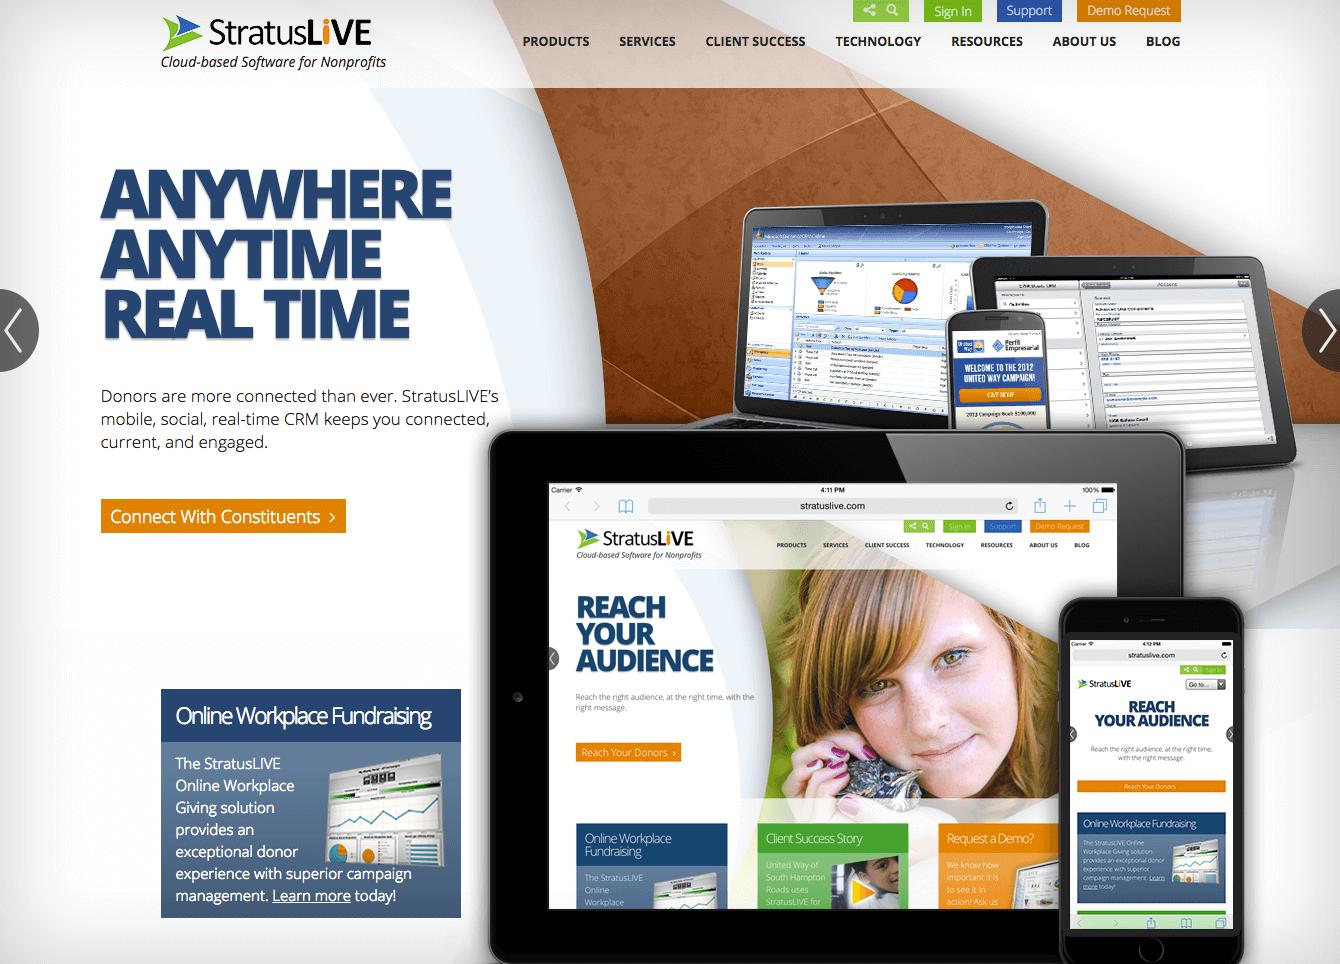 Web design sample - StratusLIVE